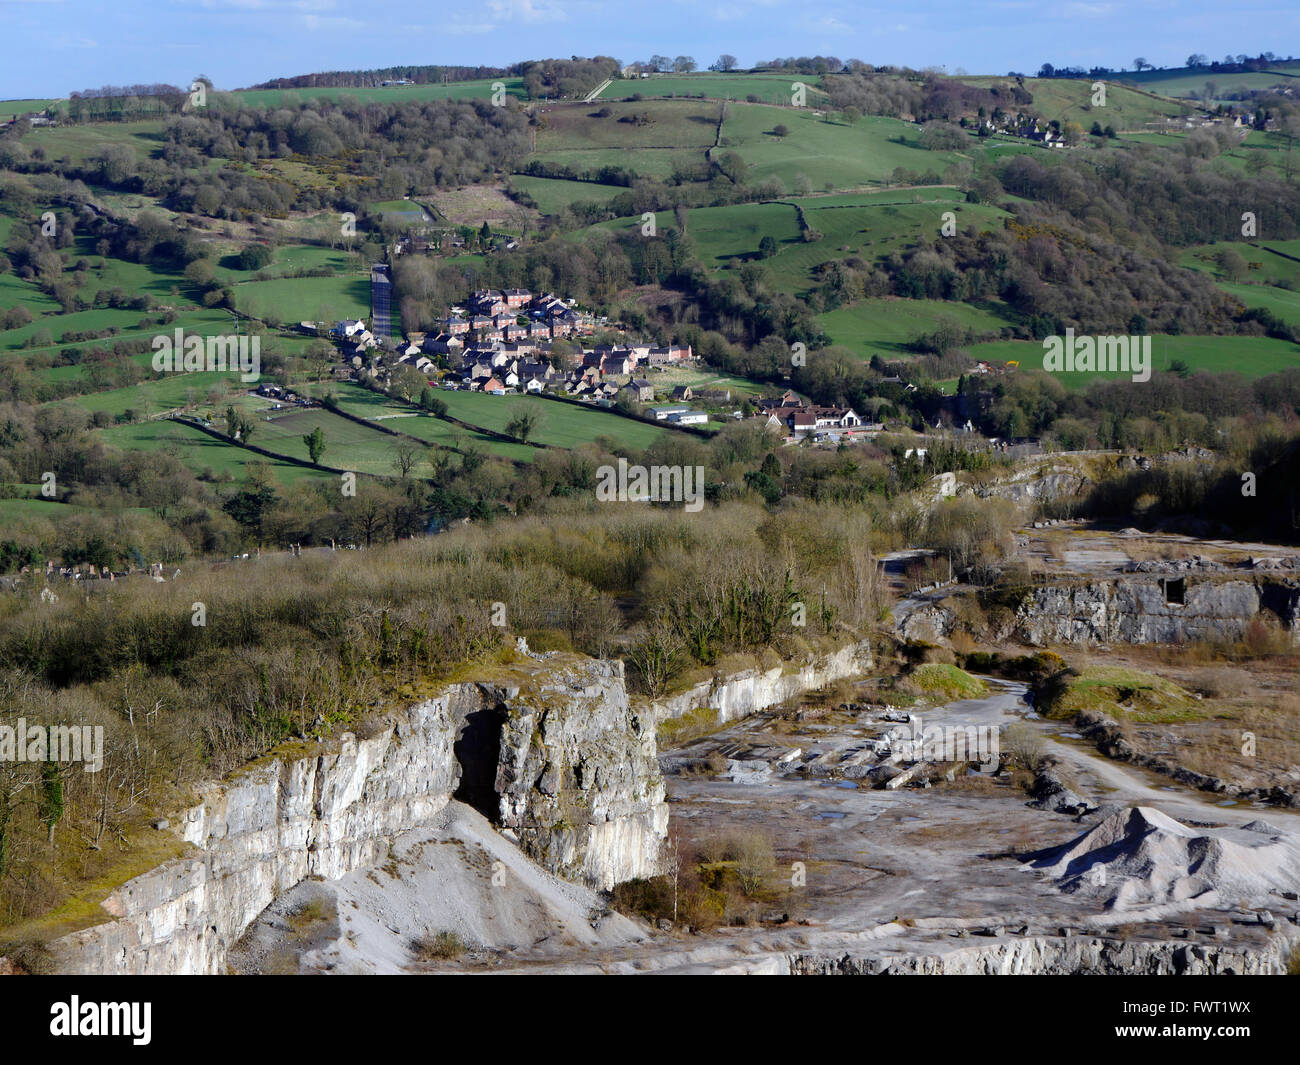 limestone quarry at Wirksworth Cromford village town Peak District – Peak Park Planning